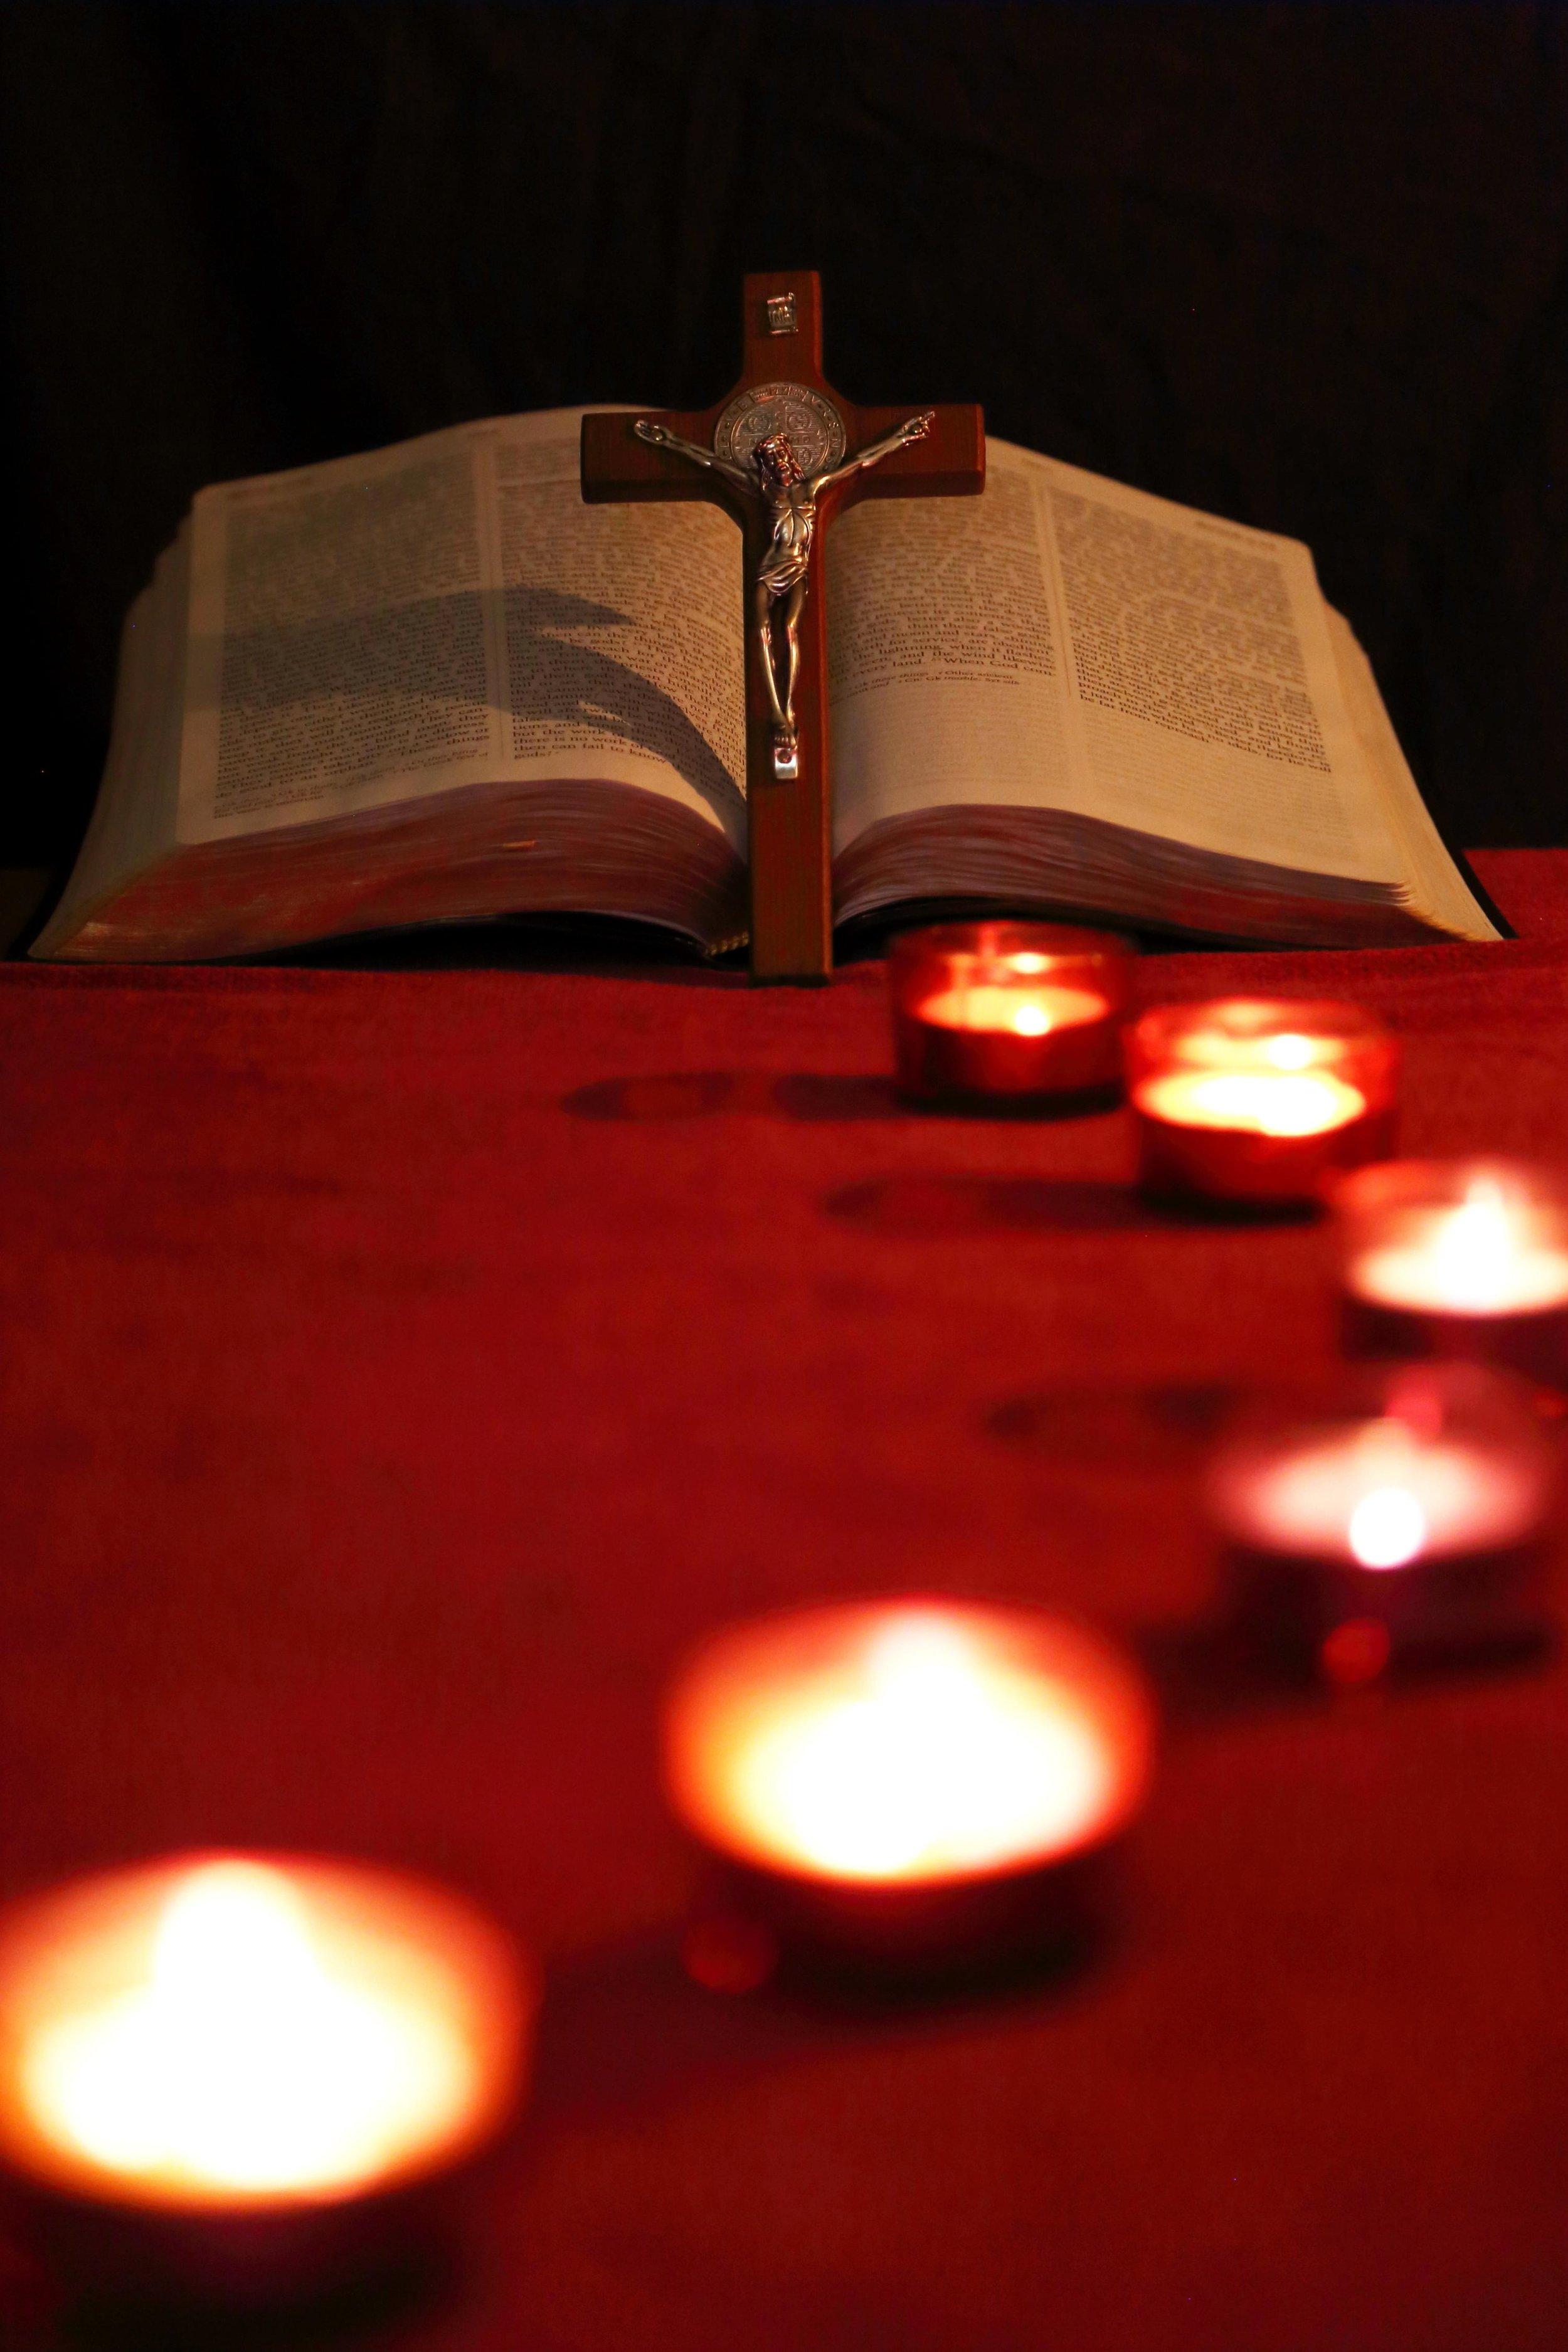 Lights leading to Cross Bible_red.JPG